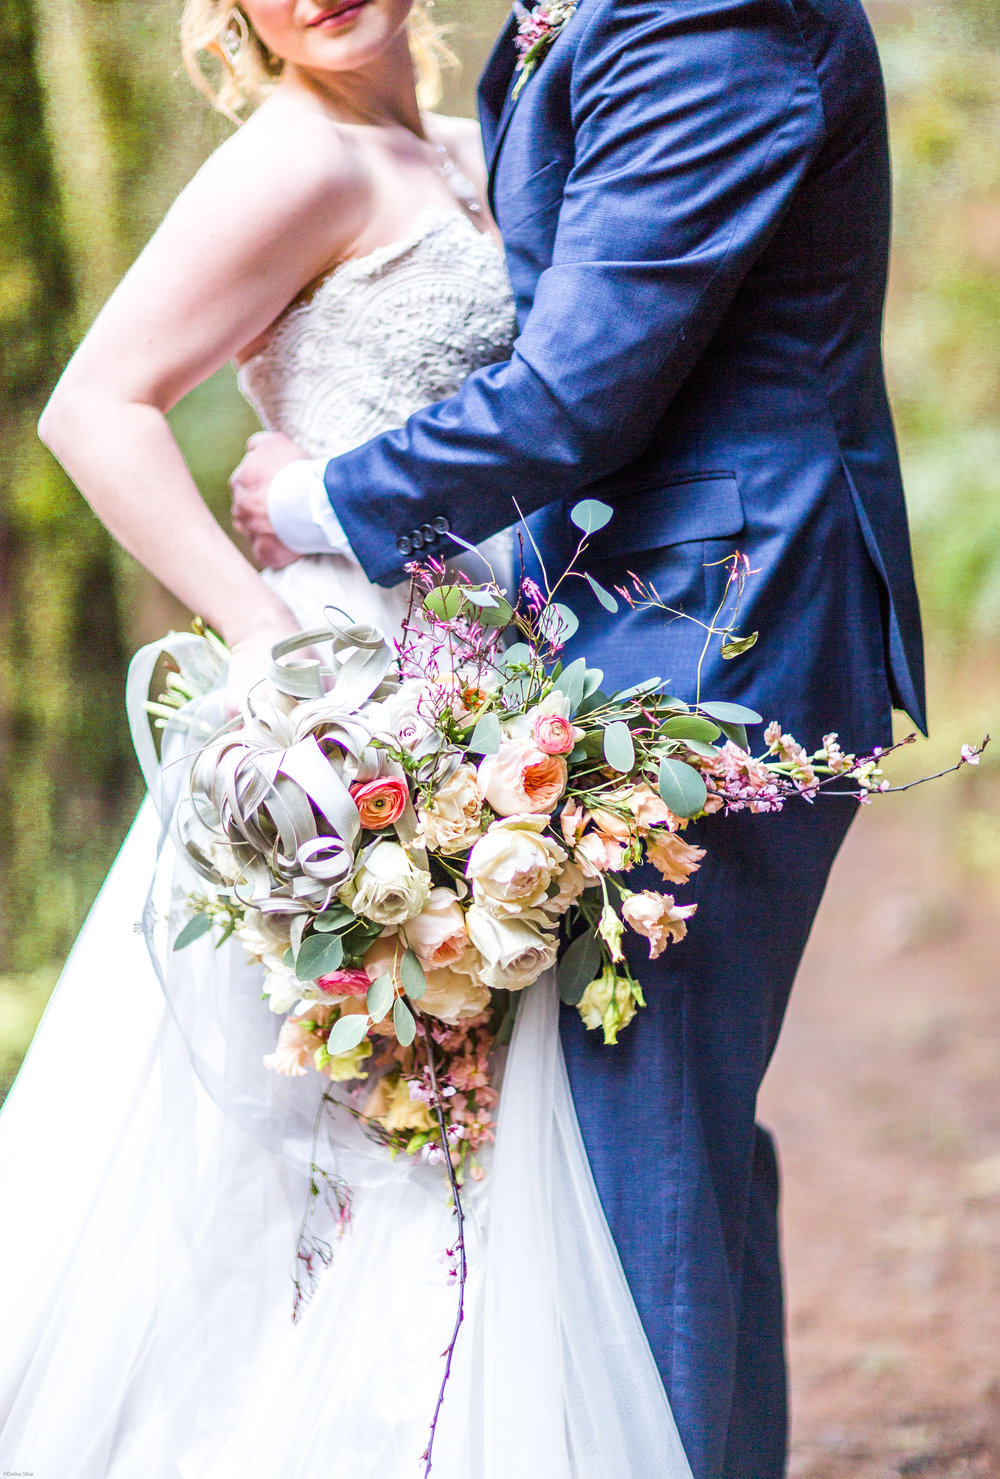 Silver Falls-elopement-bride-and-groom-photo Corina Silva Studios-79.jpg